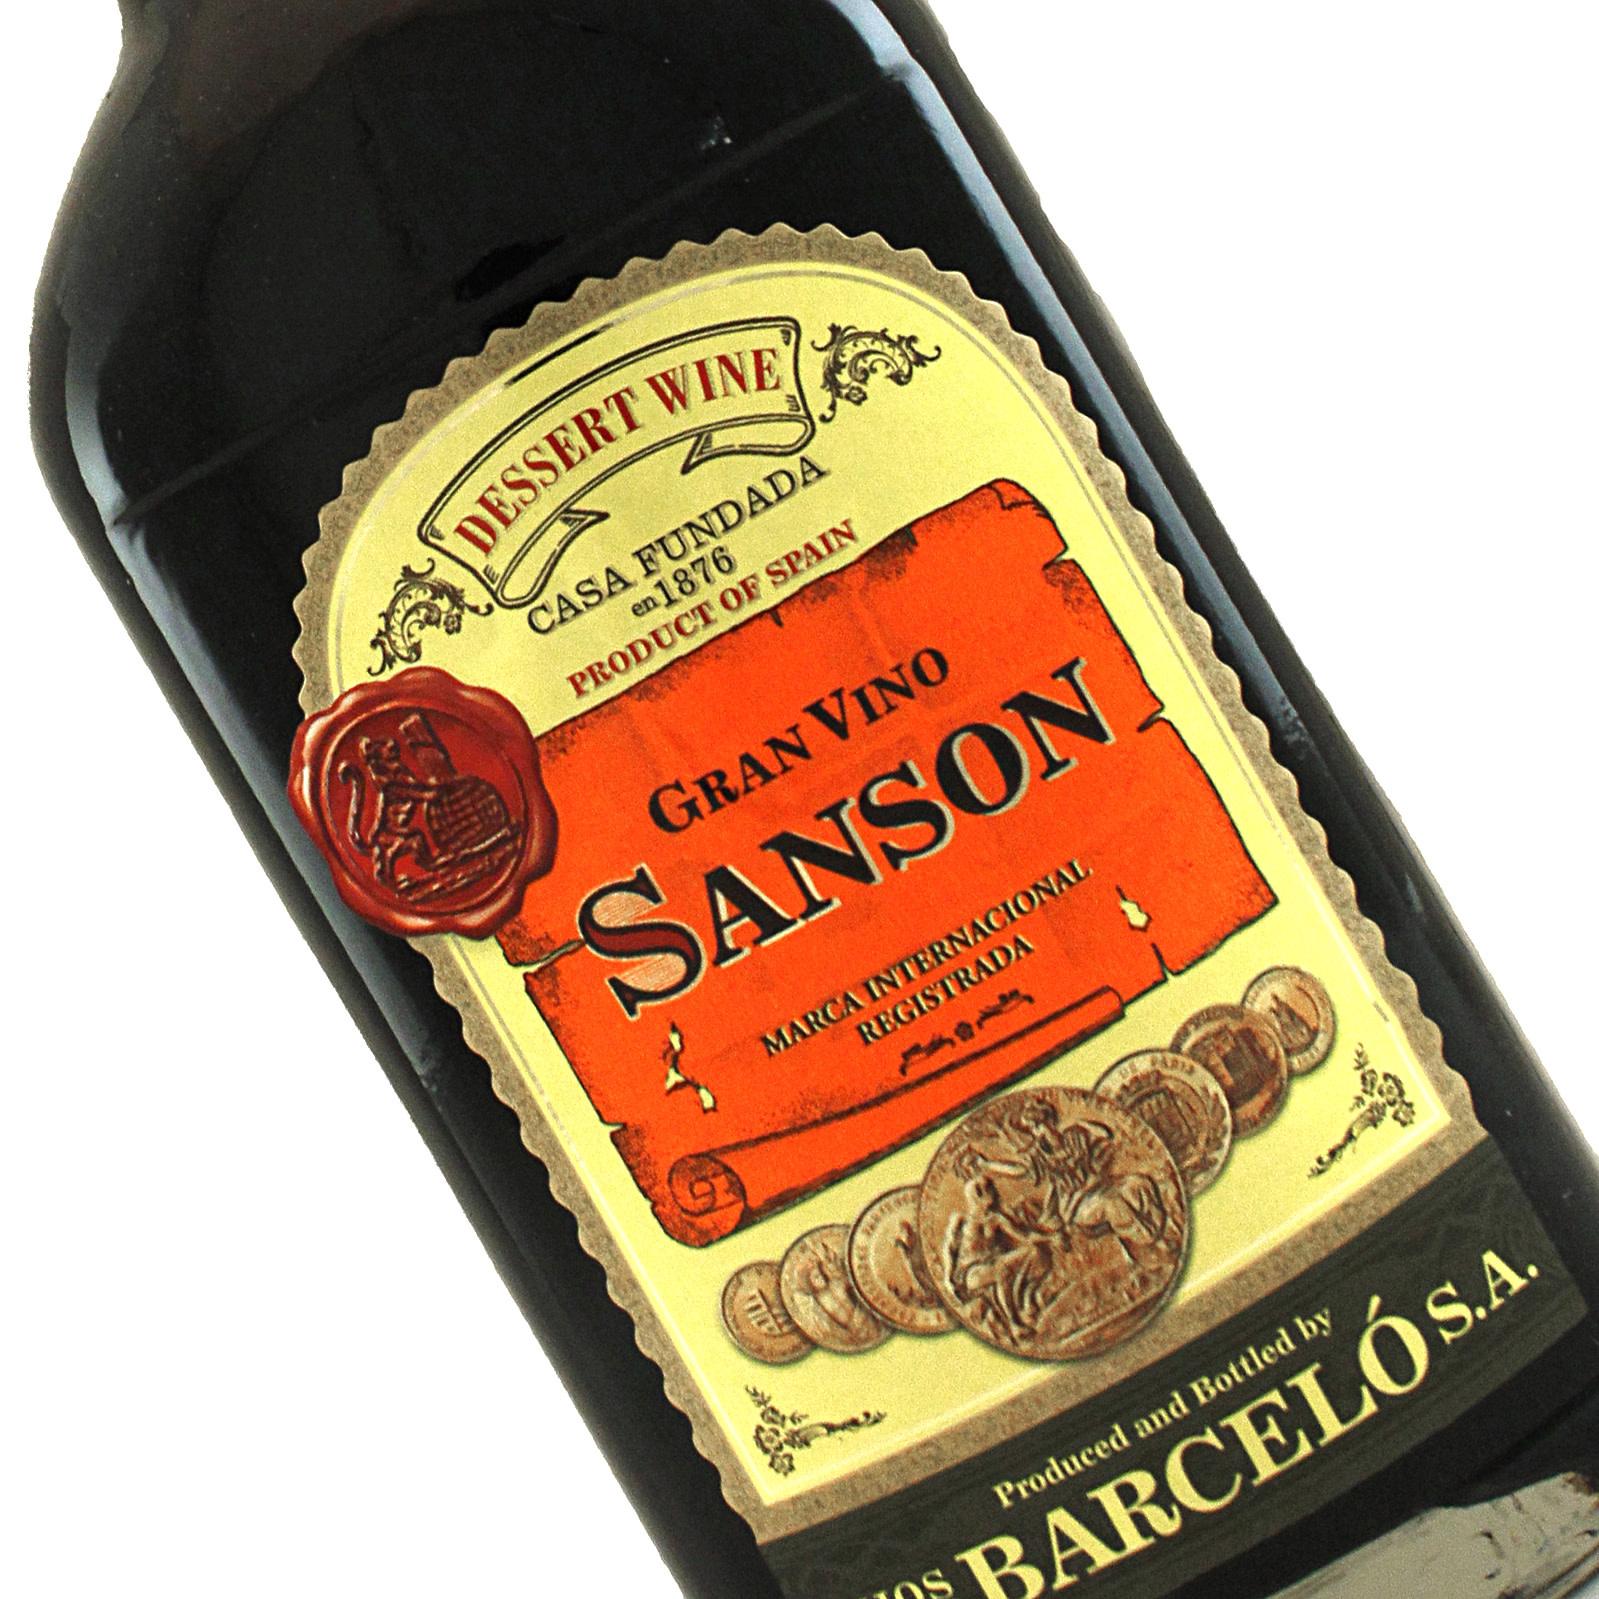 Sanson Gran Vino Dessert Wine, Spain